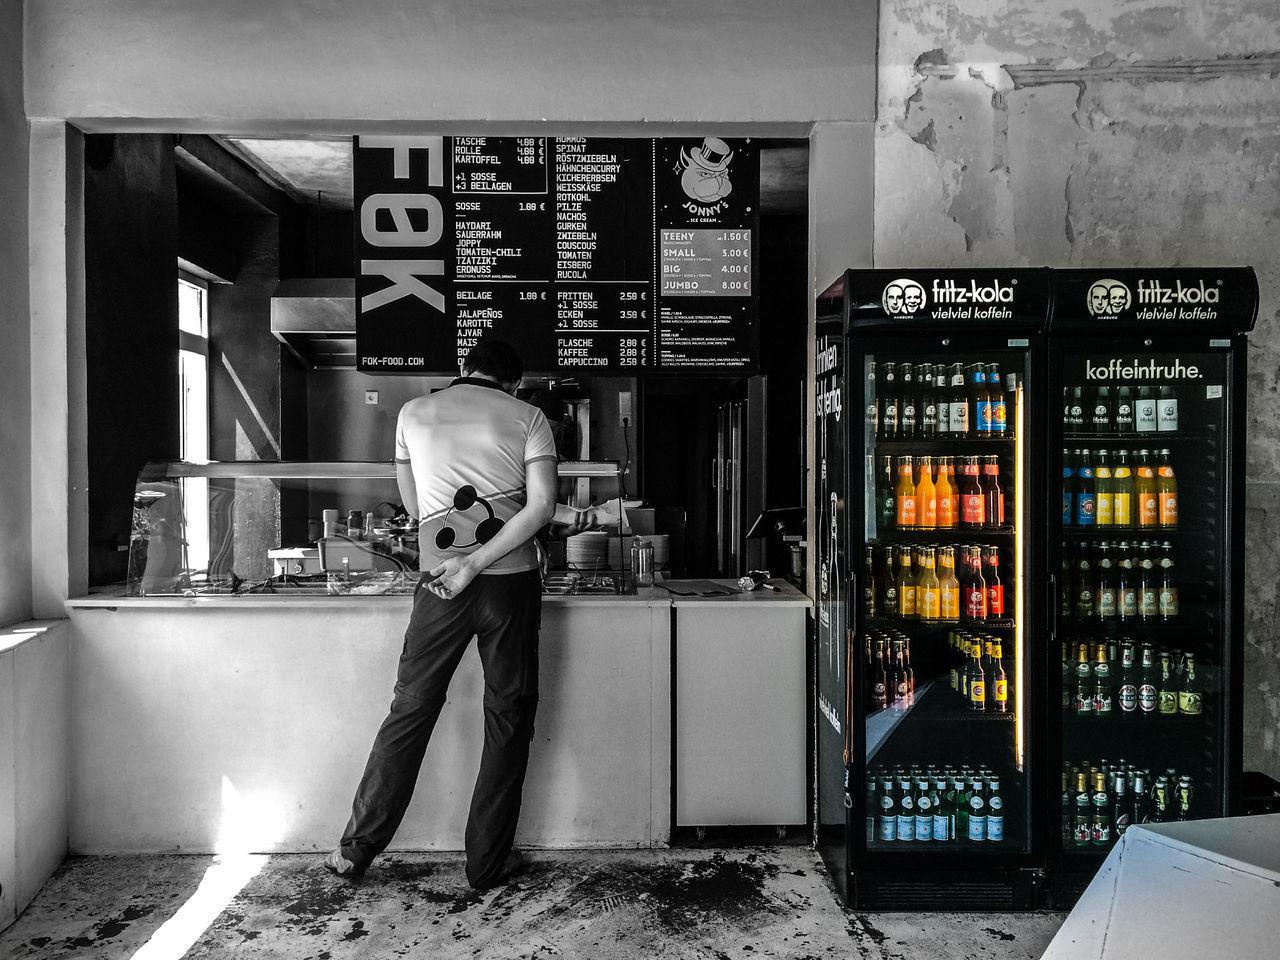 Blackandwhite Colorsplash Counter Day Fok Fritz-kola Ordering Food Shop Snack Bar Store Vending Machine